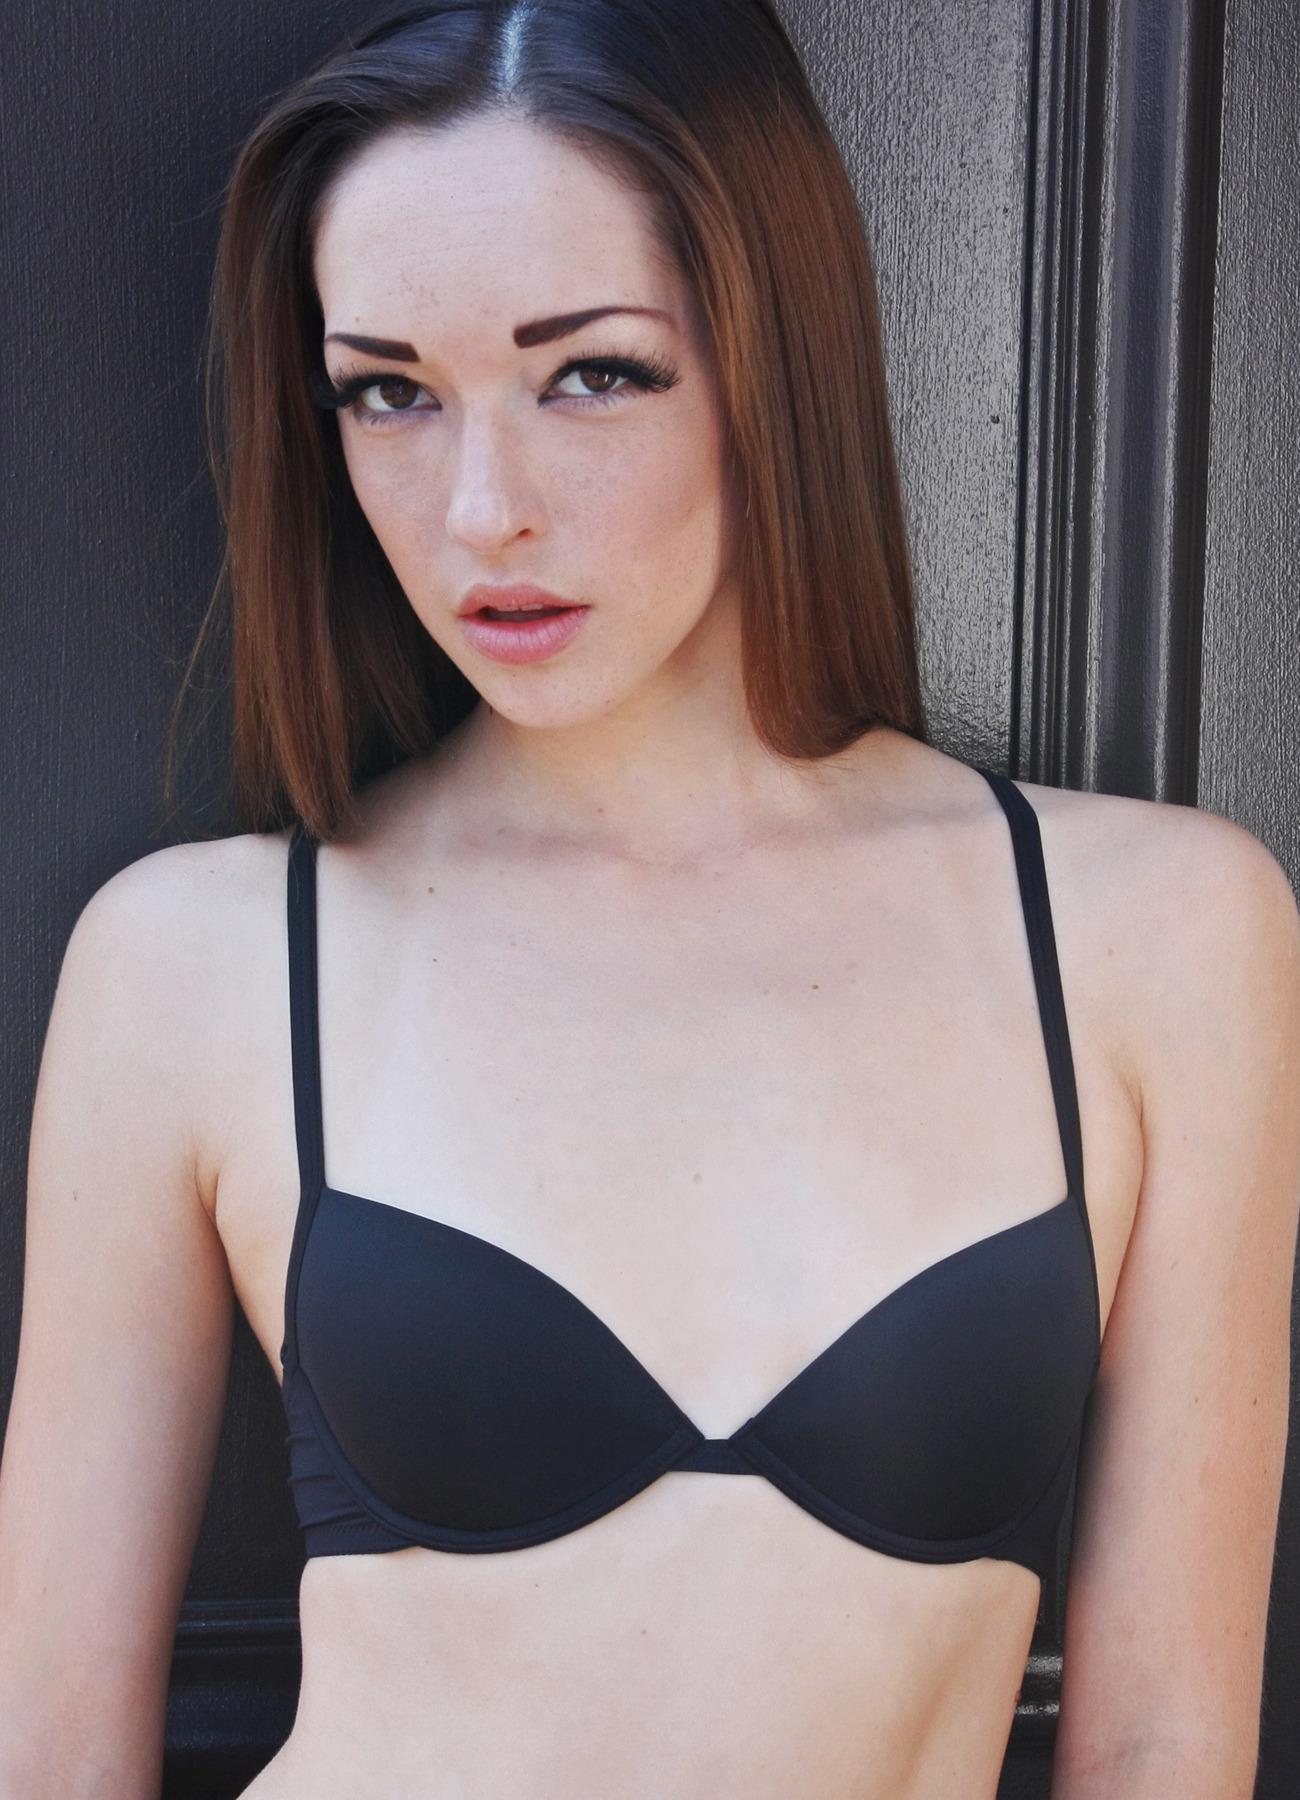 Free Aaa Cup Breast Pics